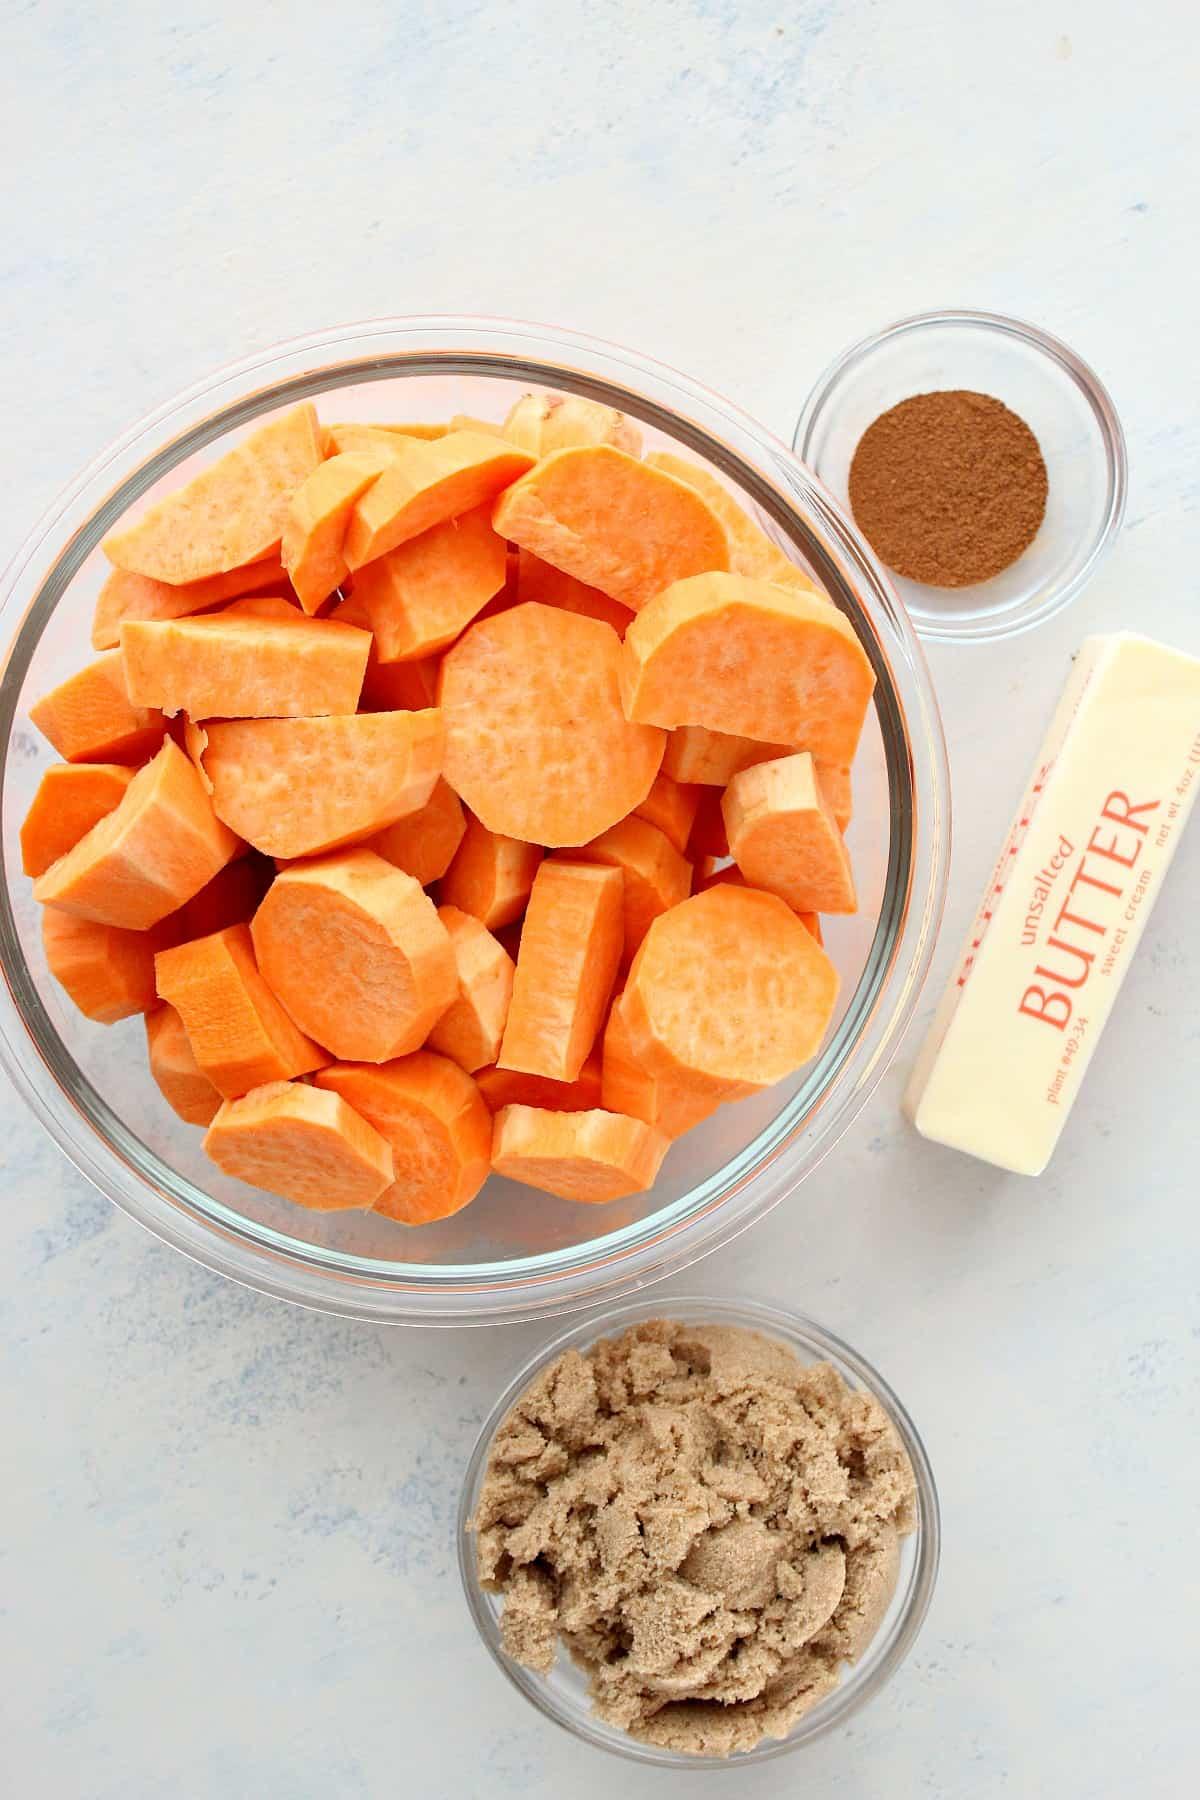 ingredientes de batata-doce cristalizada Batata-doce cristalizada